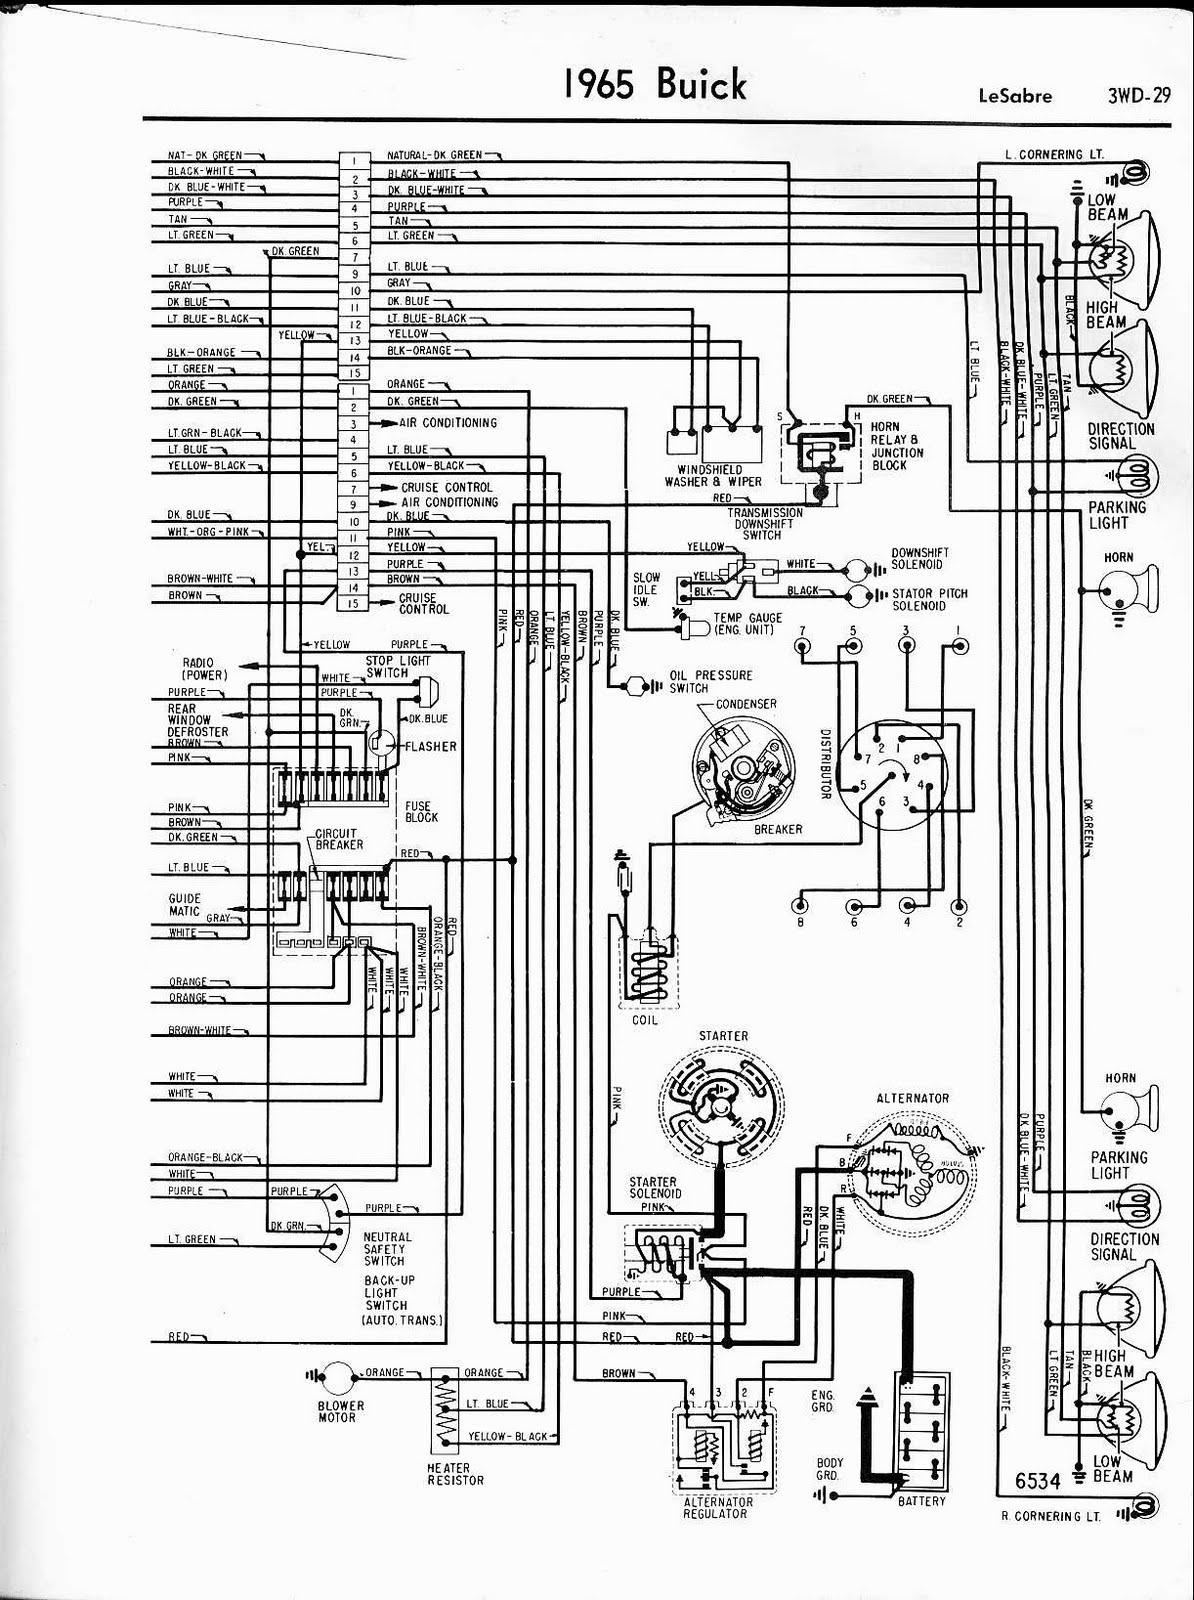 Nissan Altima Wiring Diagram Further Pathfinder Throttle Body Wiring Diagram ~ ODICIS